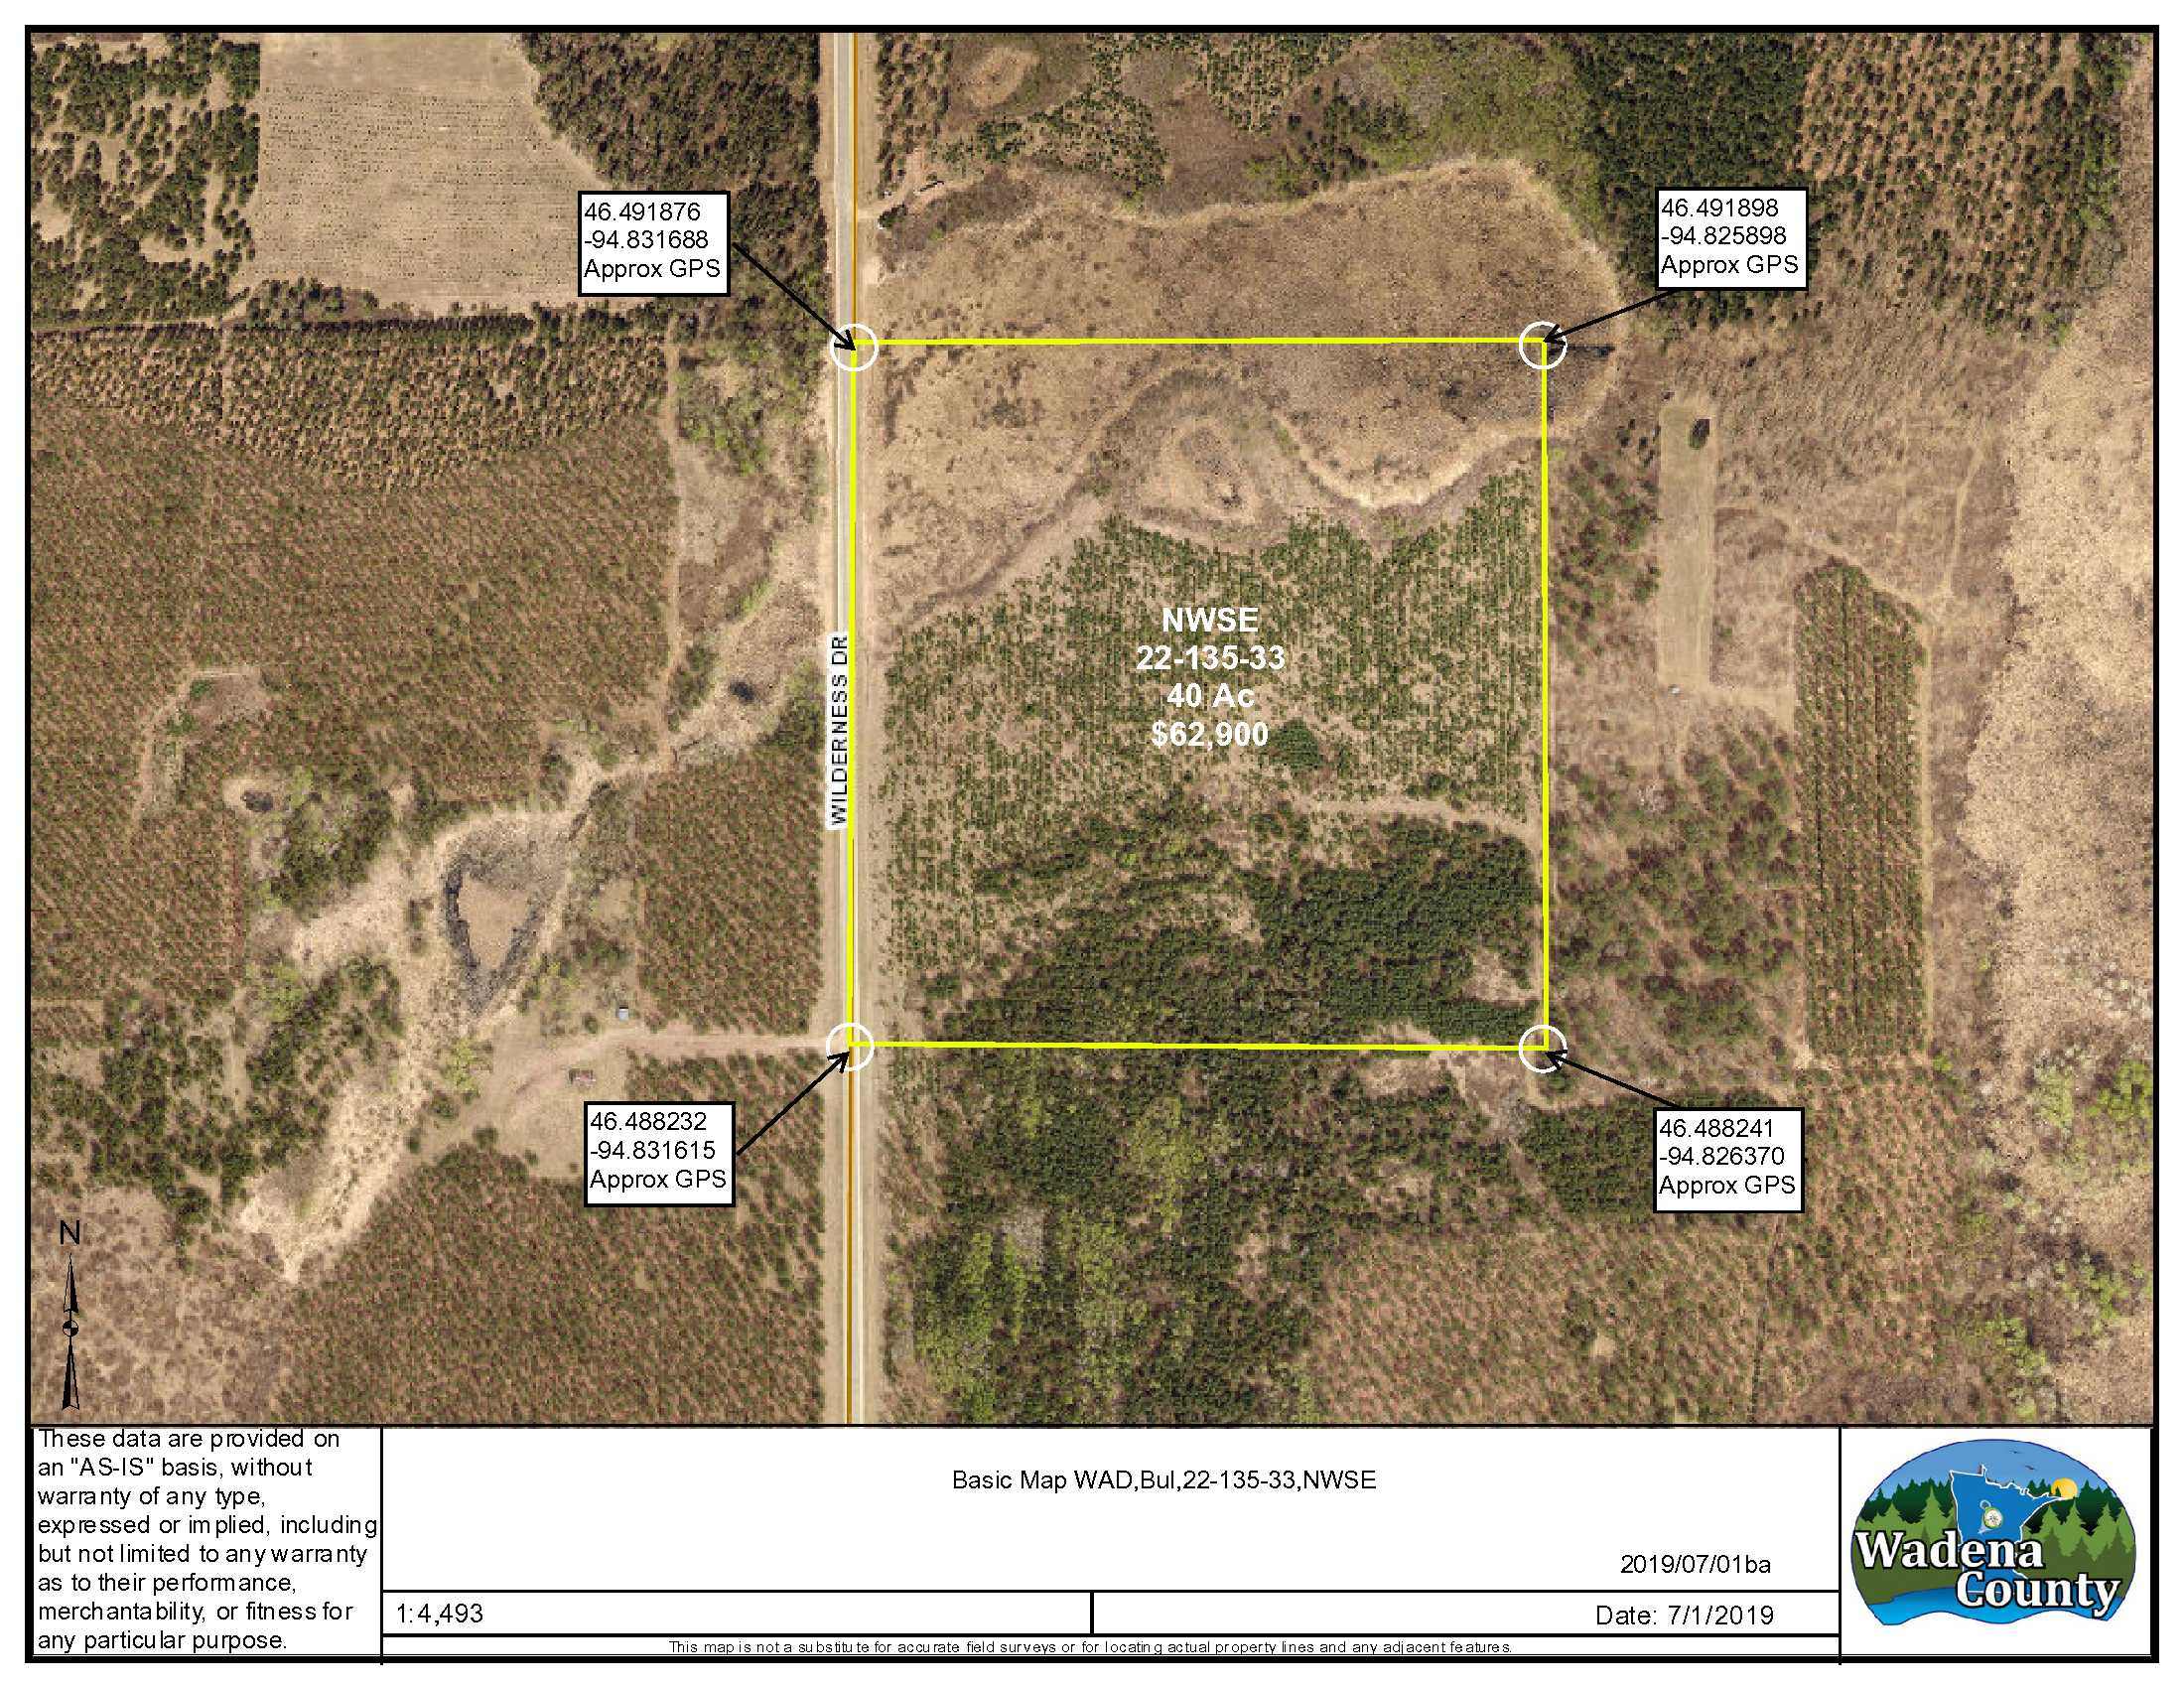 NWSE Wilderness Dr, Bullard Twp, Staples, Wadena County